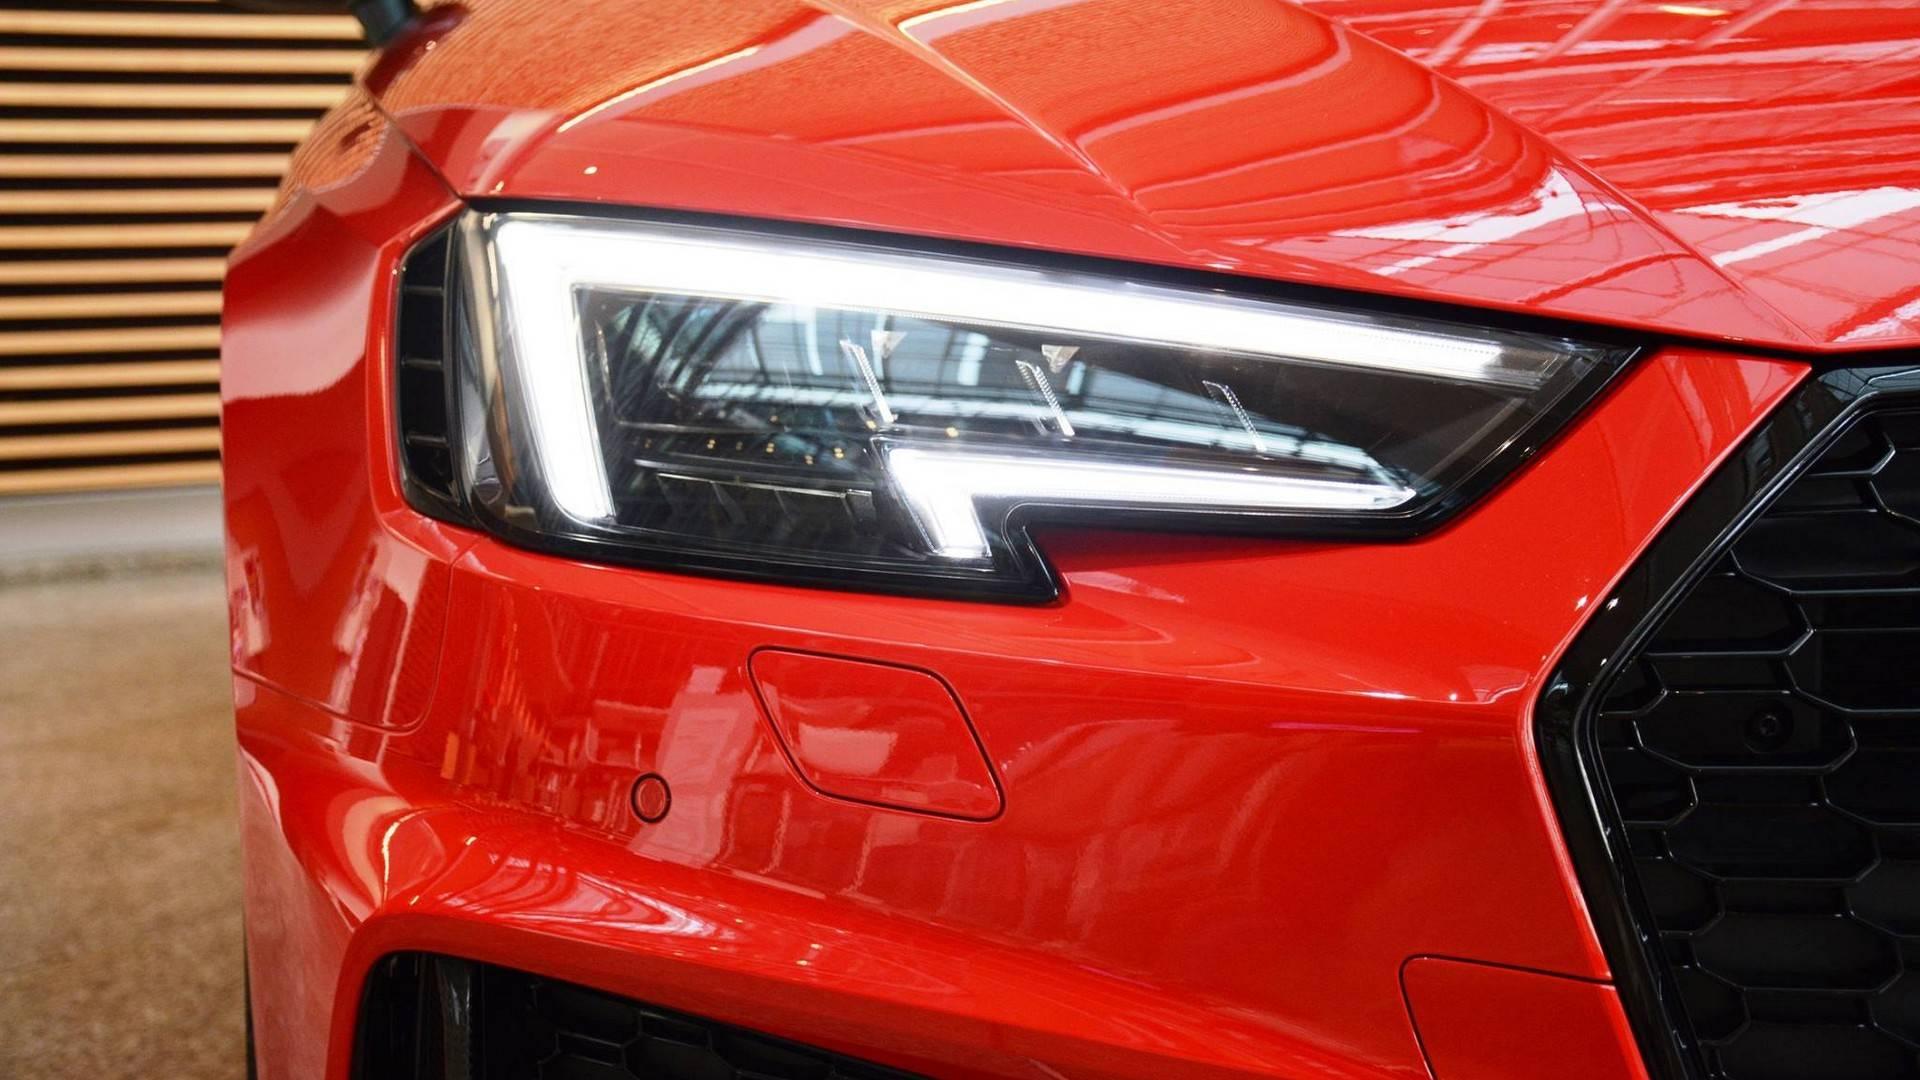 5a153f9d47f61 2018 audi rs4 avant misano red آئودی RS4 آوانت ۲۰۱۸ رونمایی شد   اجاره ماشین